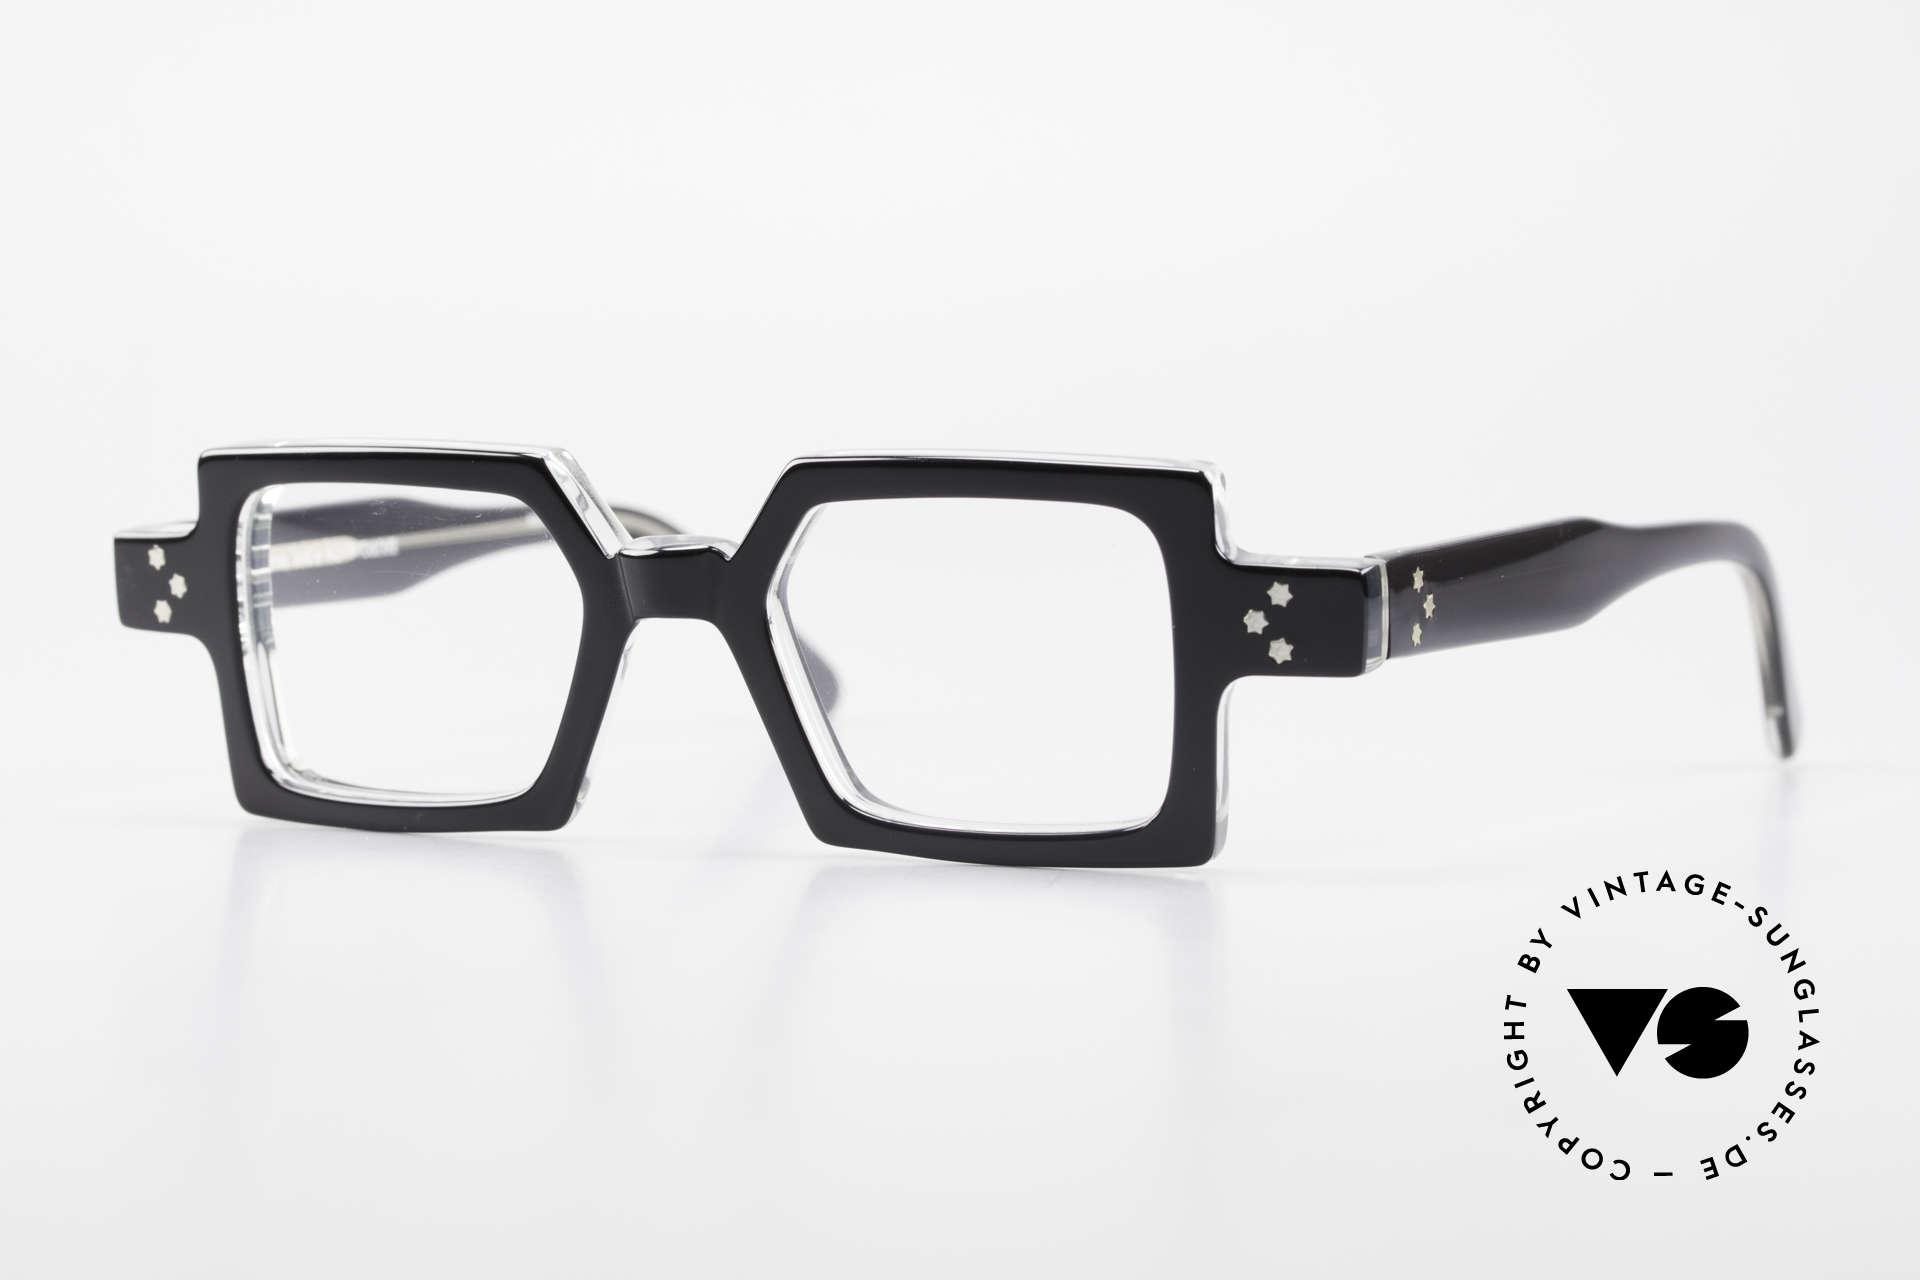 Anne Et Valentin Chico Square Old 80's Eyeglasses, vintage glasses by 'Anne Et Valentin', Toulouse, Made for Men and Women